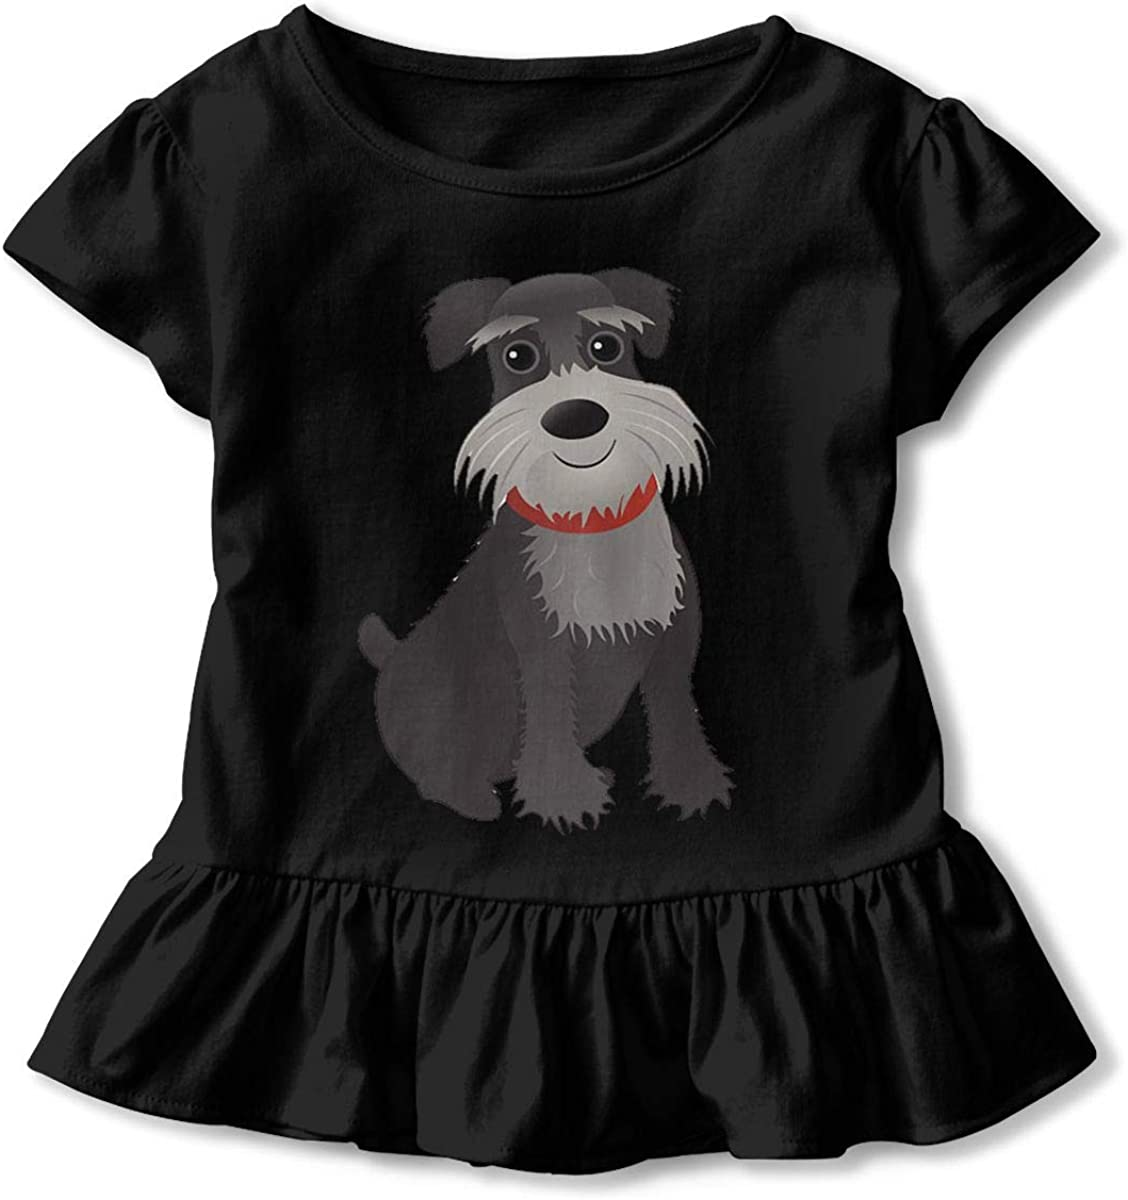 Mini Schnauzer Dog Shirt Baby Girls Ruffles Casual Tops for 2-6 Years Old Baby Black